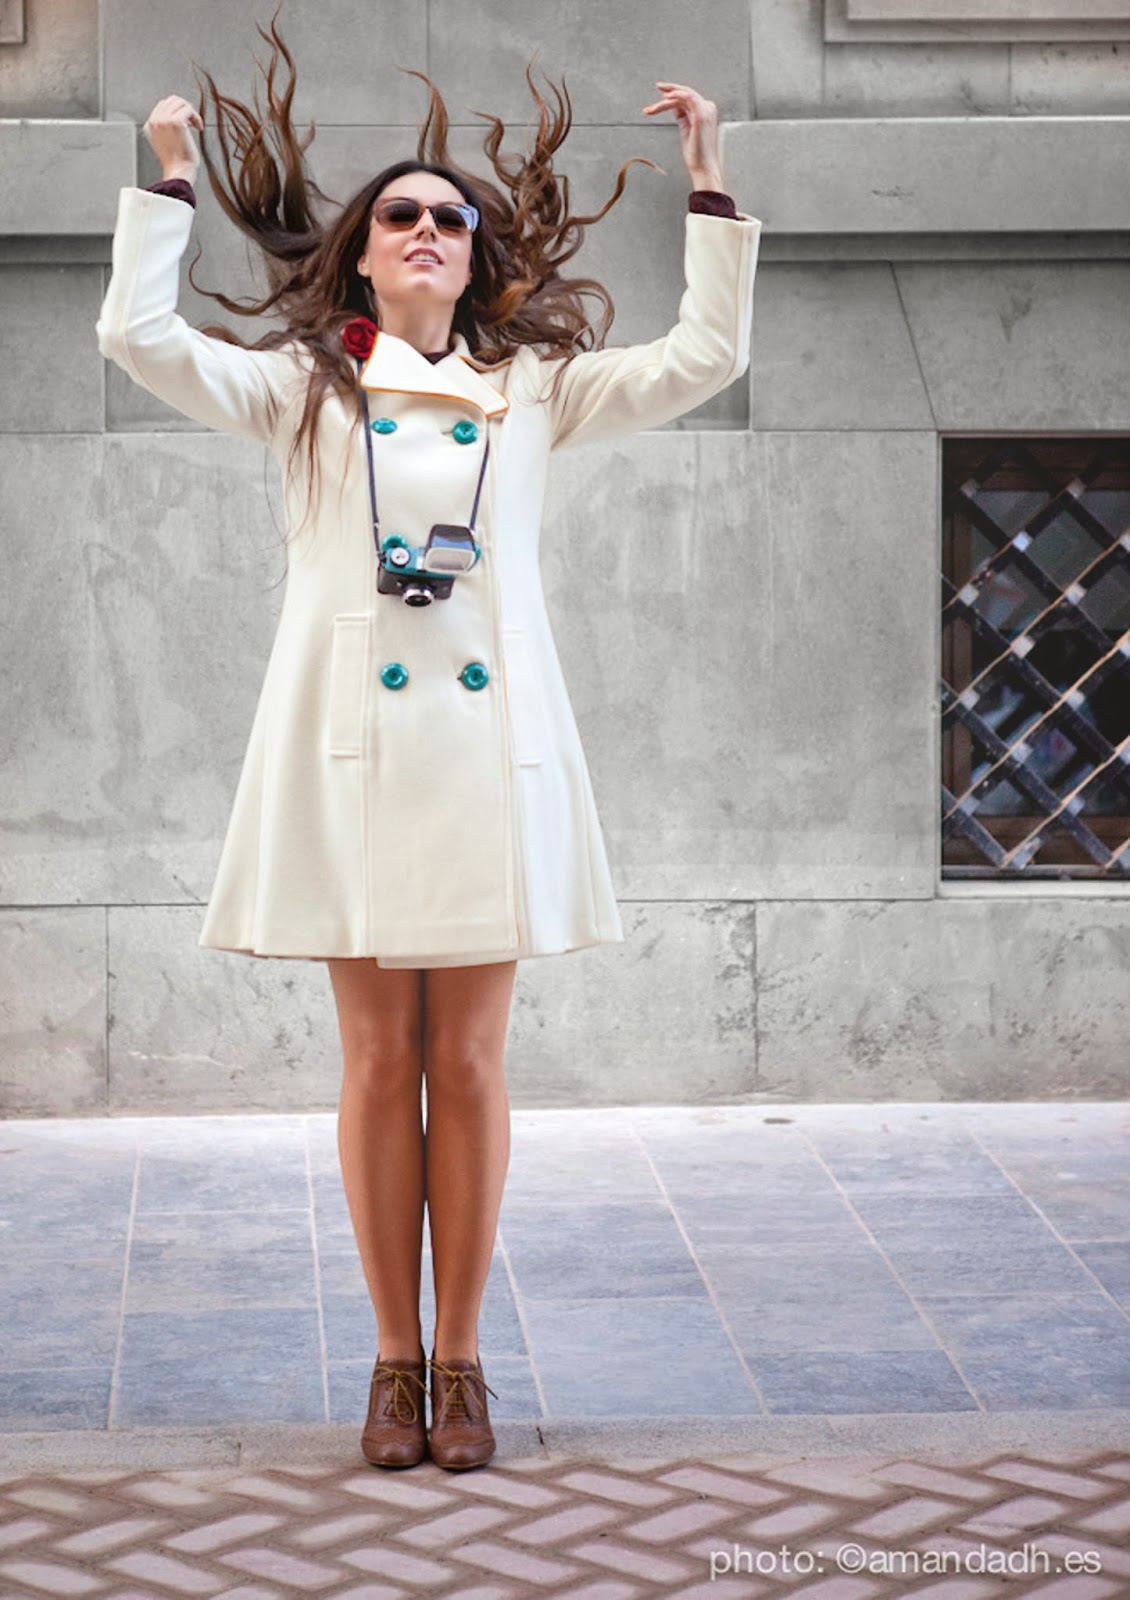 Woll coat with silk and cotton - Senorita Martita FALL-WINTER street style by Amanda Dreamhunter - timeless italian design